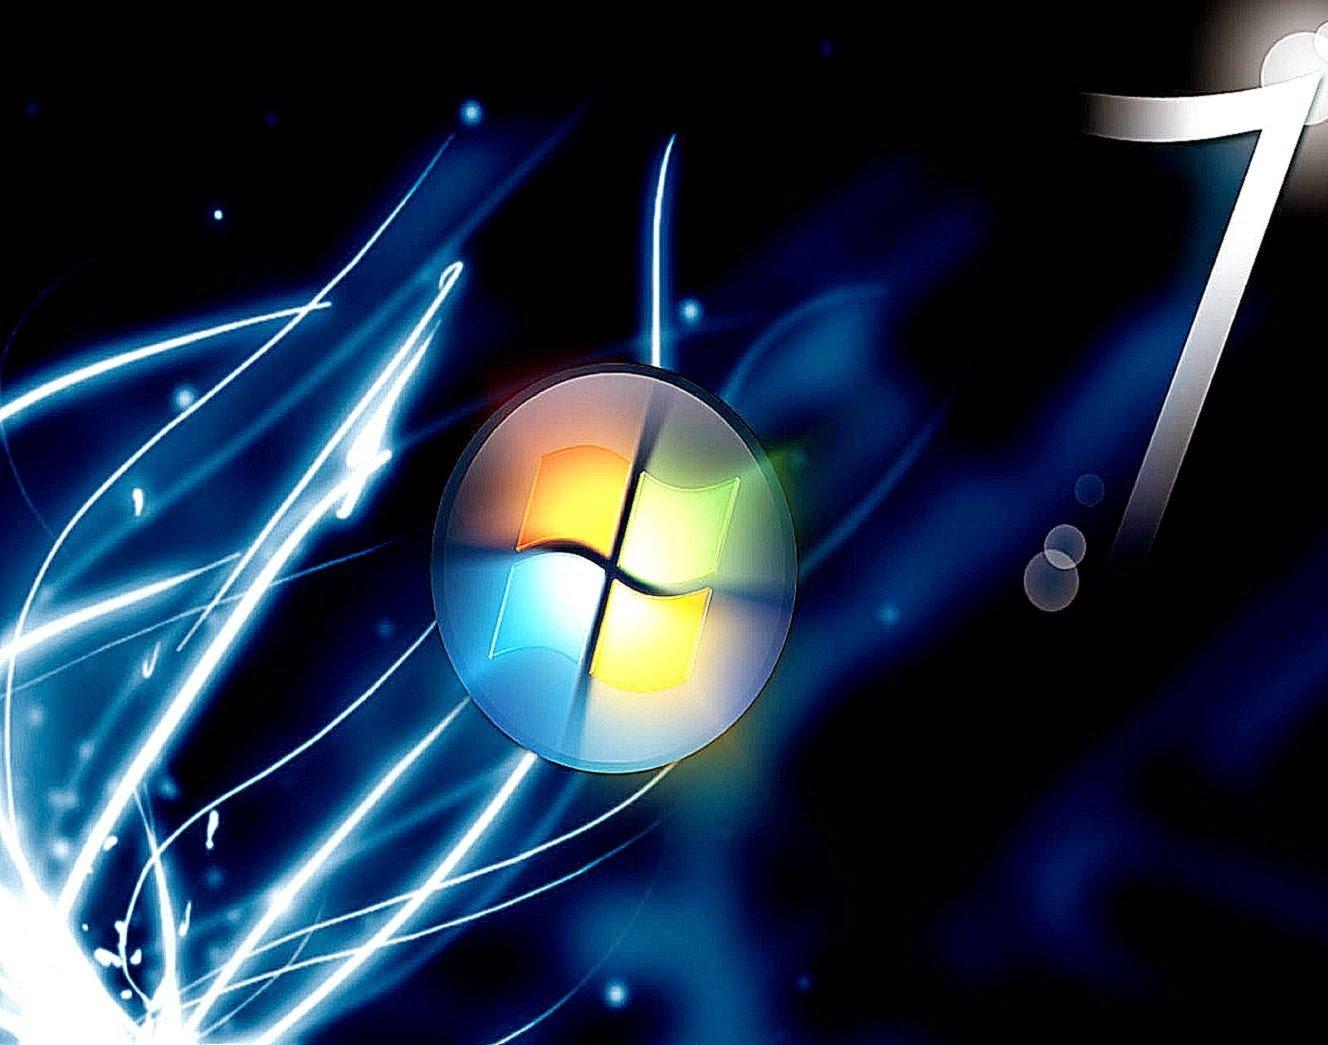 50 animated desktop wallpaper windows 7 on wallpapersafari - Windows animated wallpaper ...